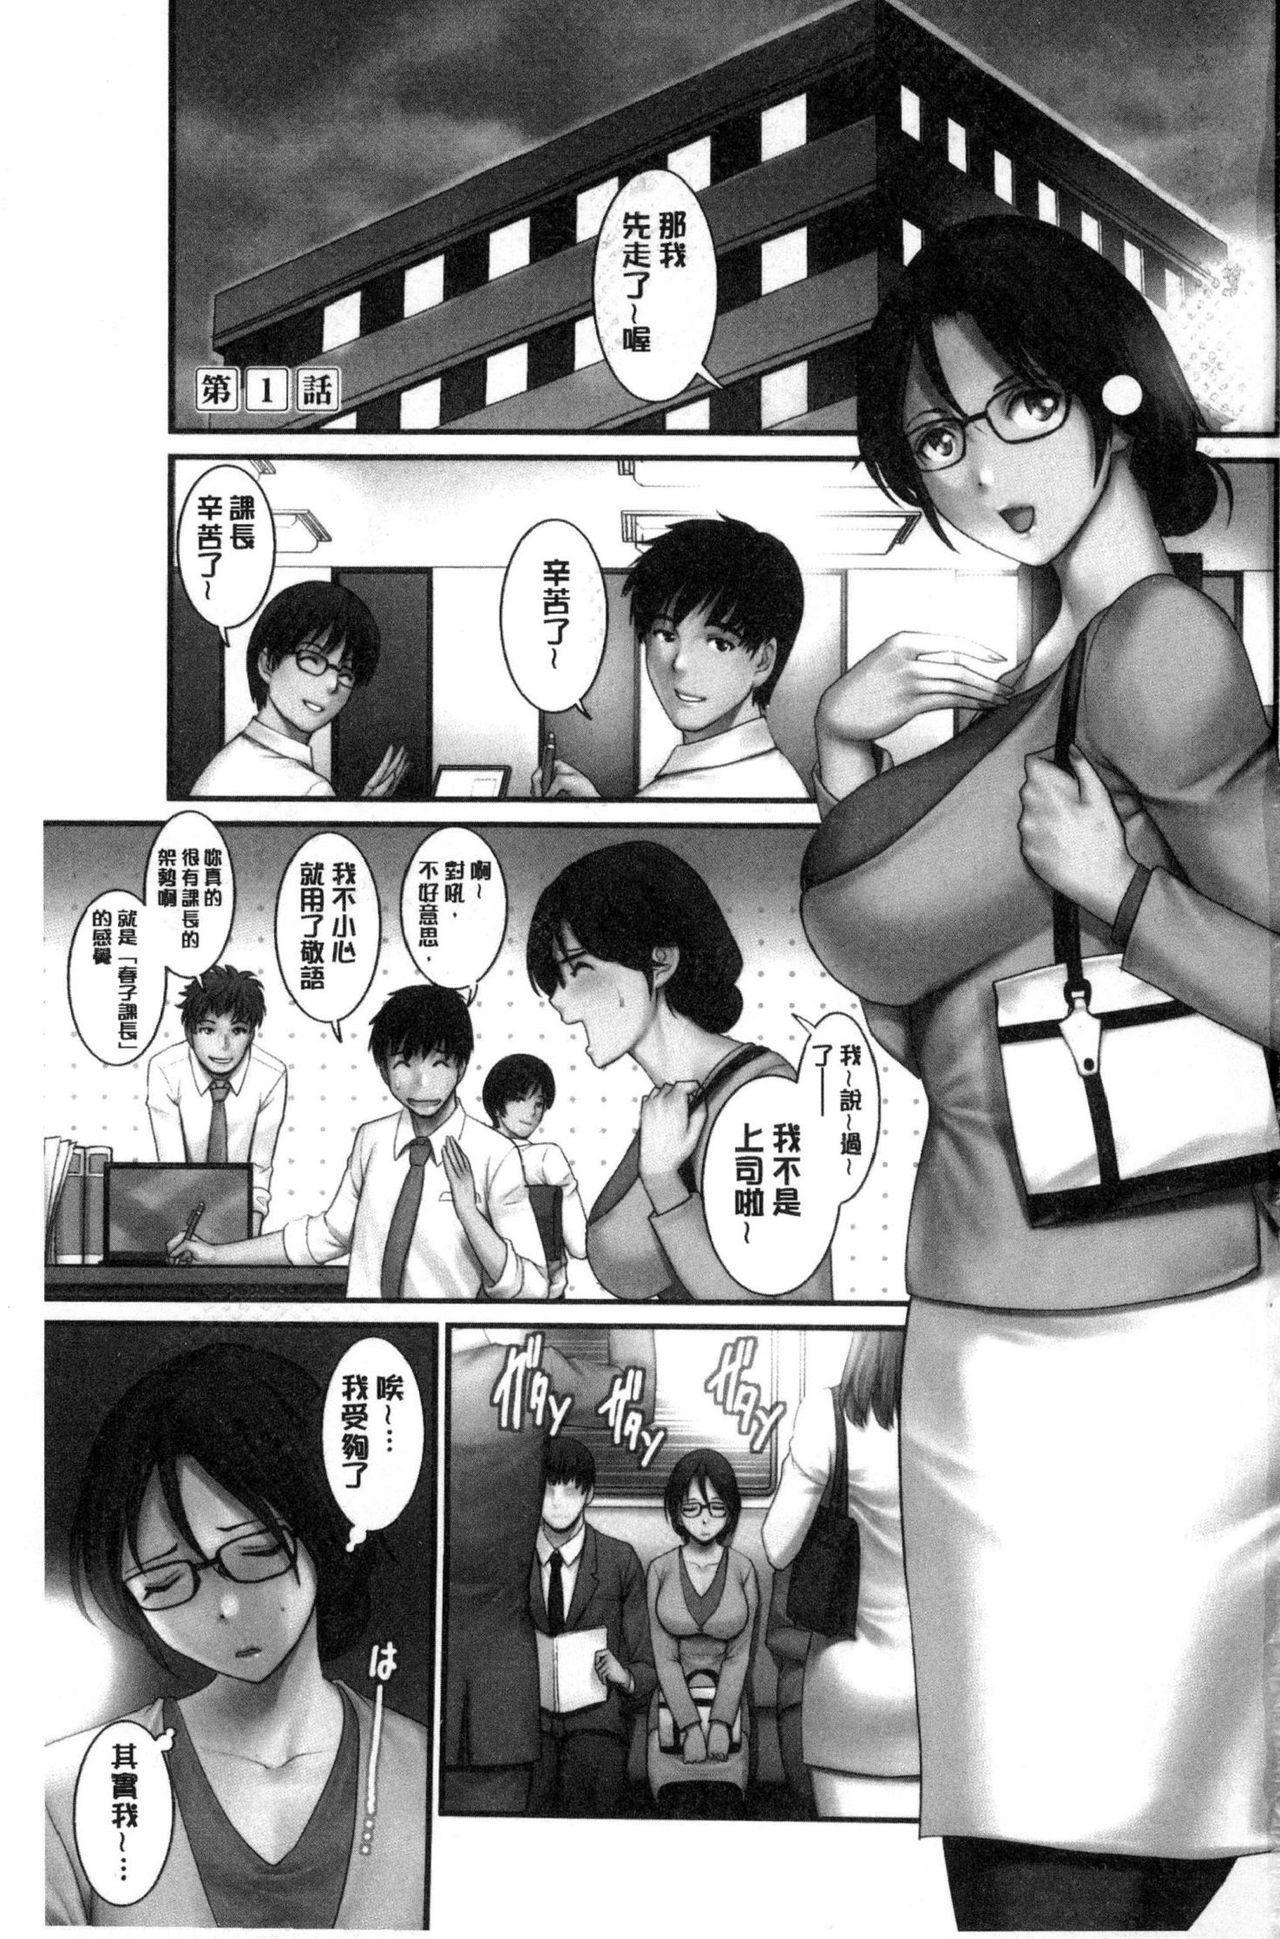 Toshimaku Sodachi no Toshima-san   年增區孕育的豐島小姐 1